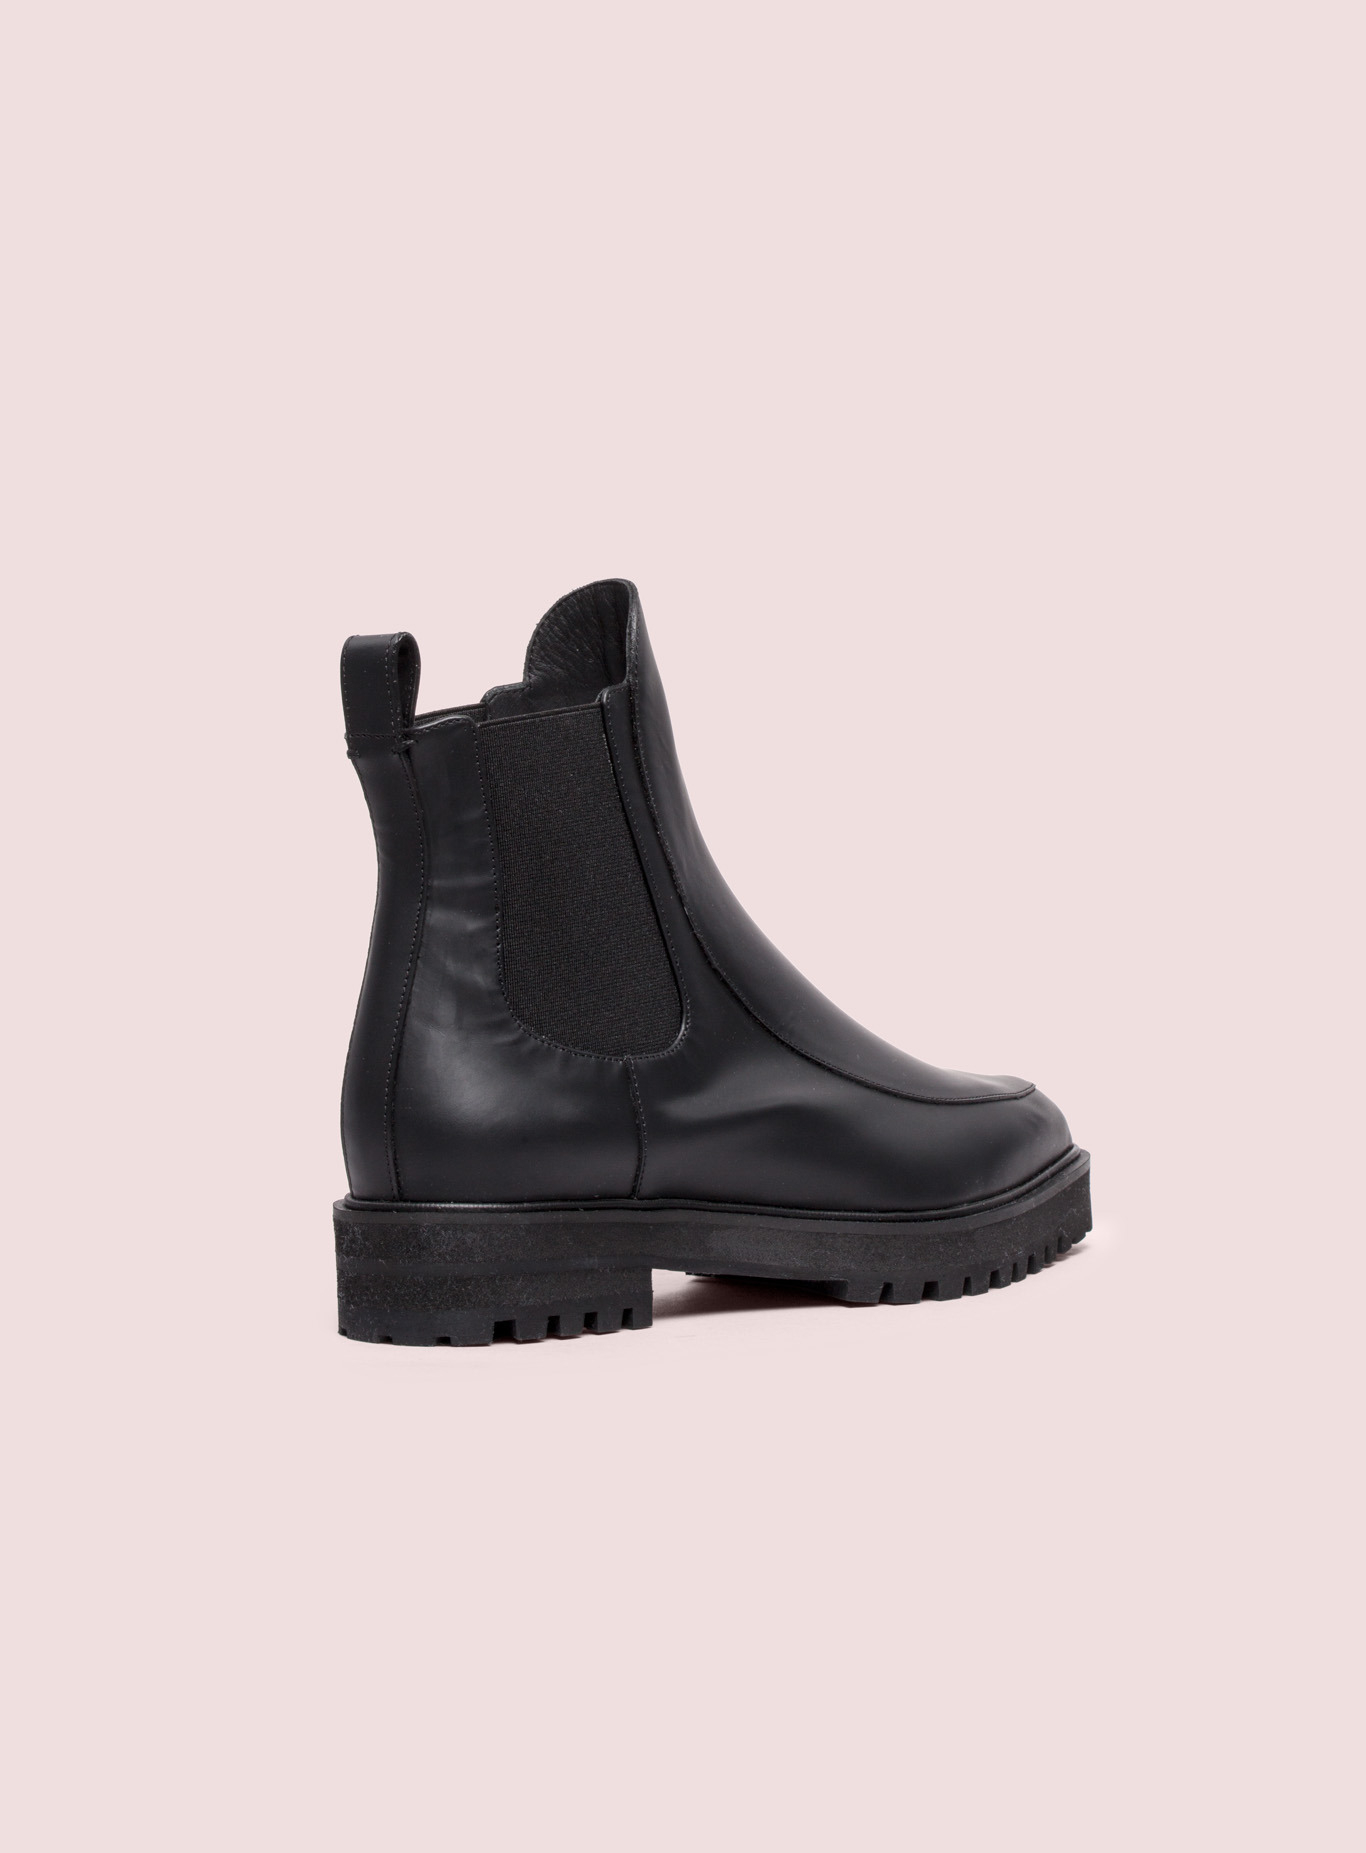 Proenza schouler Flat Ankle Boot in Black | Lyst